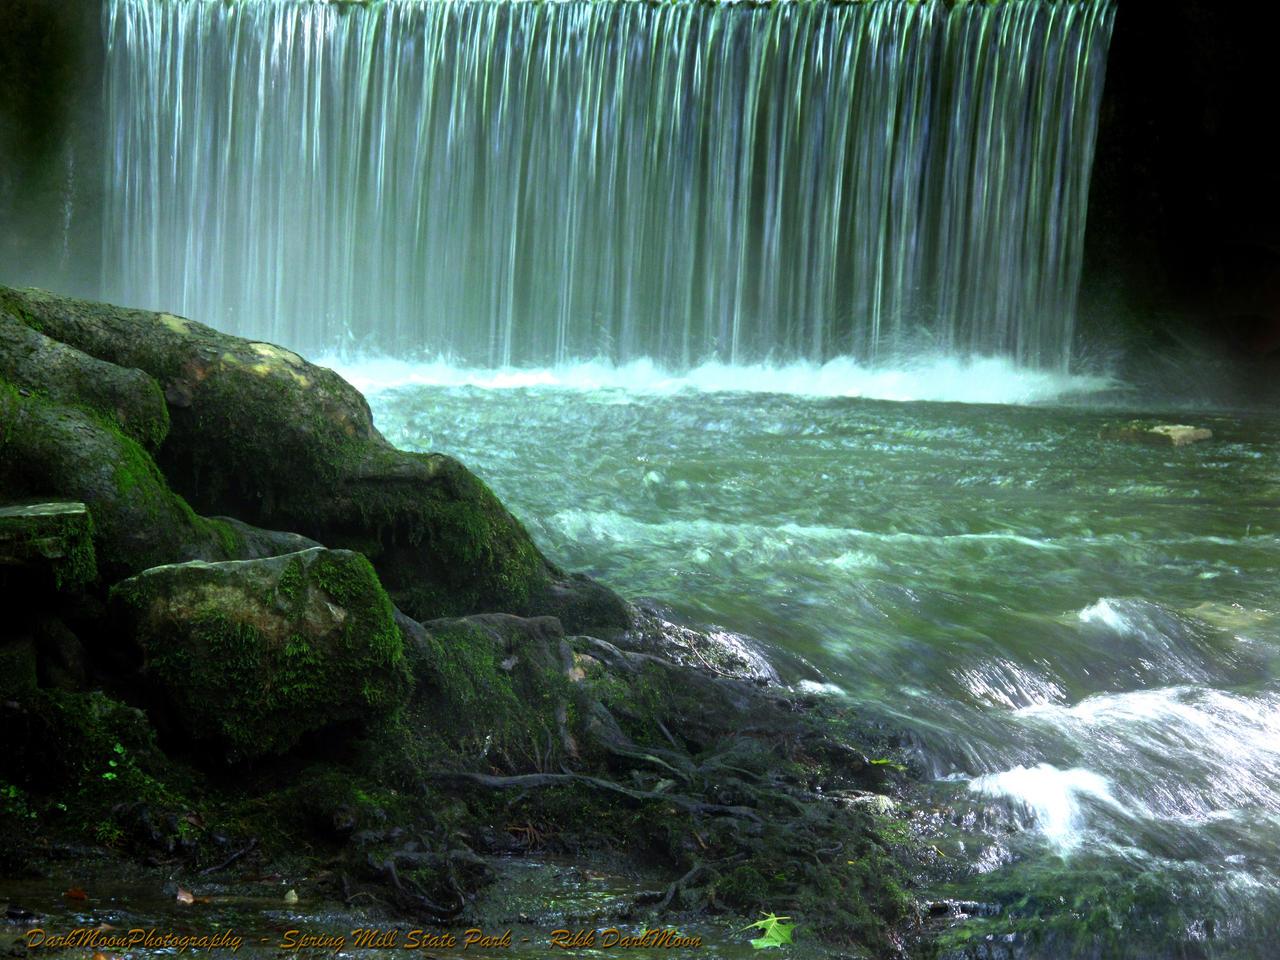 SpringMillIndiana-4872-WP-M by darkmoonphoto